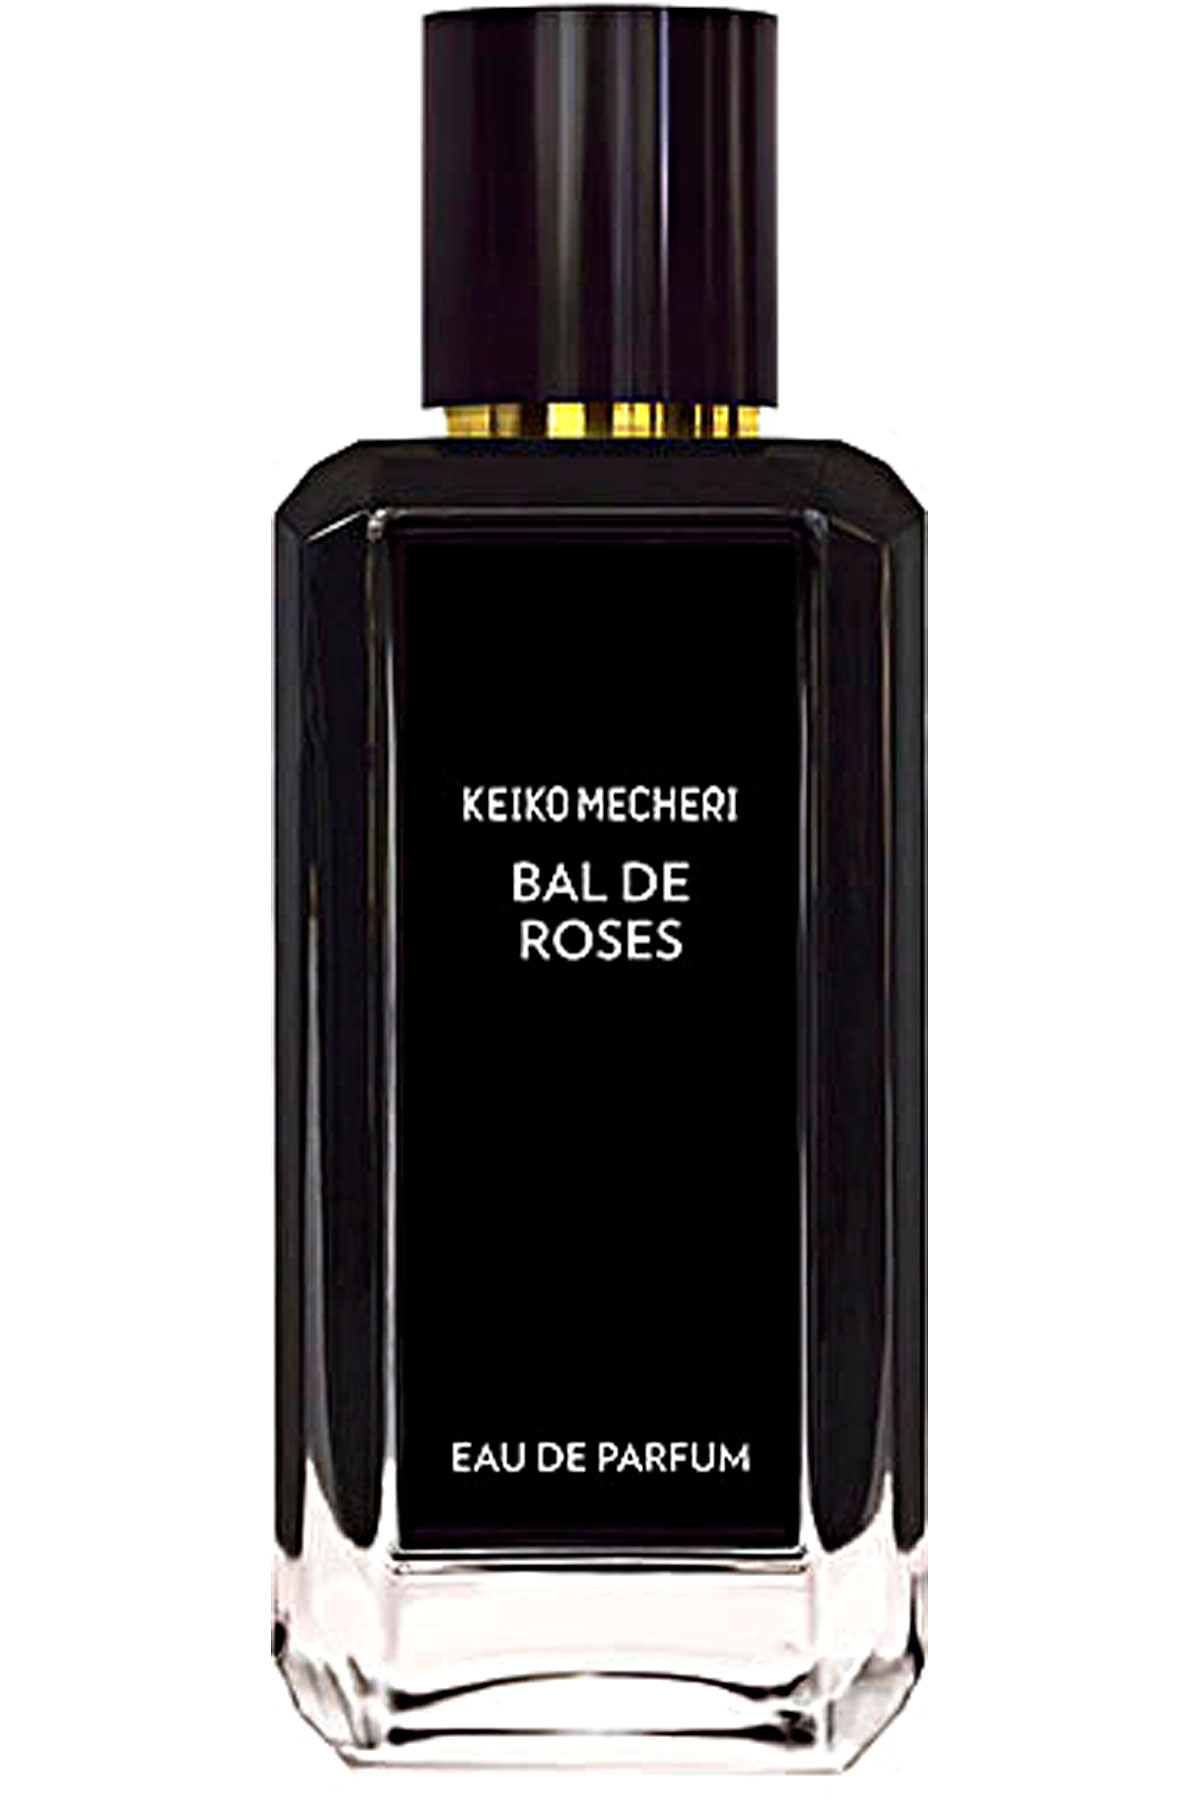 Keiko Mecheri Fragrances for Women, Bal De Roses - Eau De Parfum - 100 Ml, 2019, 100 ml